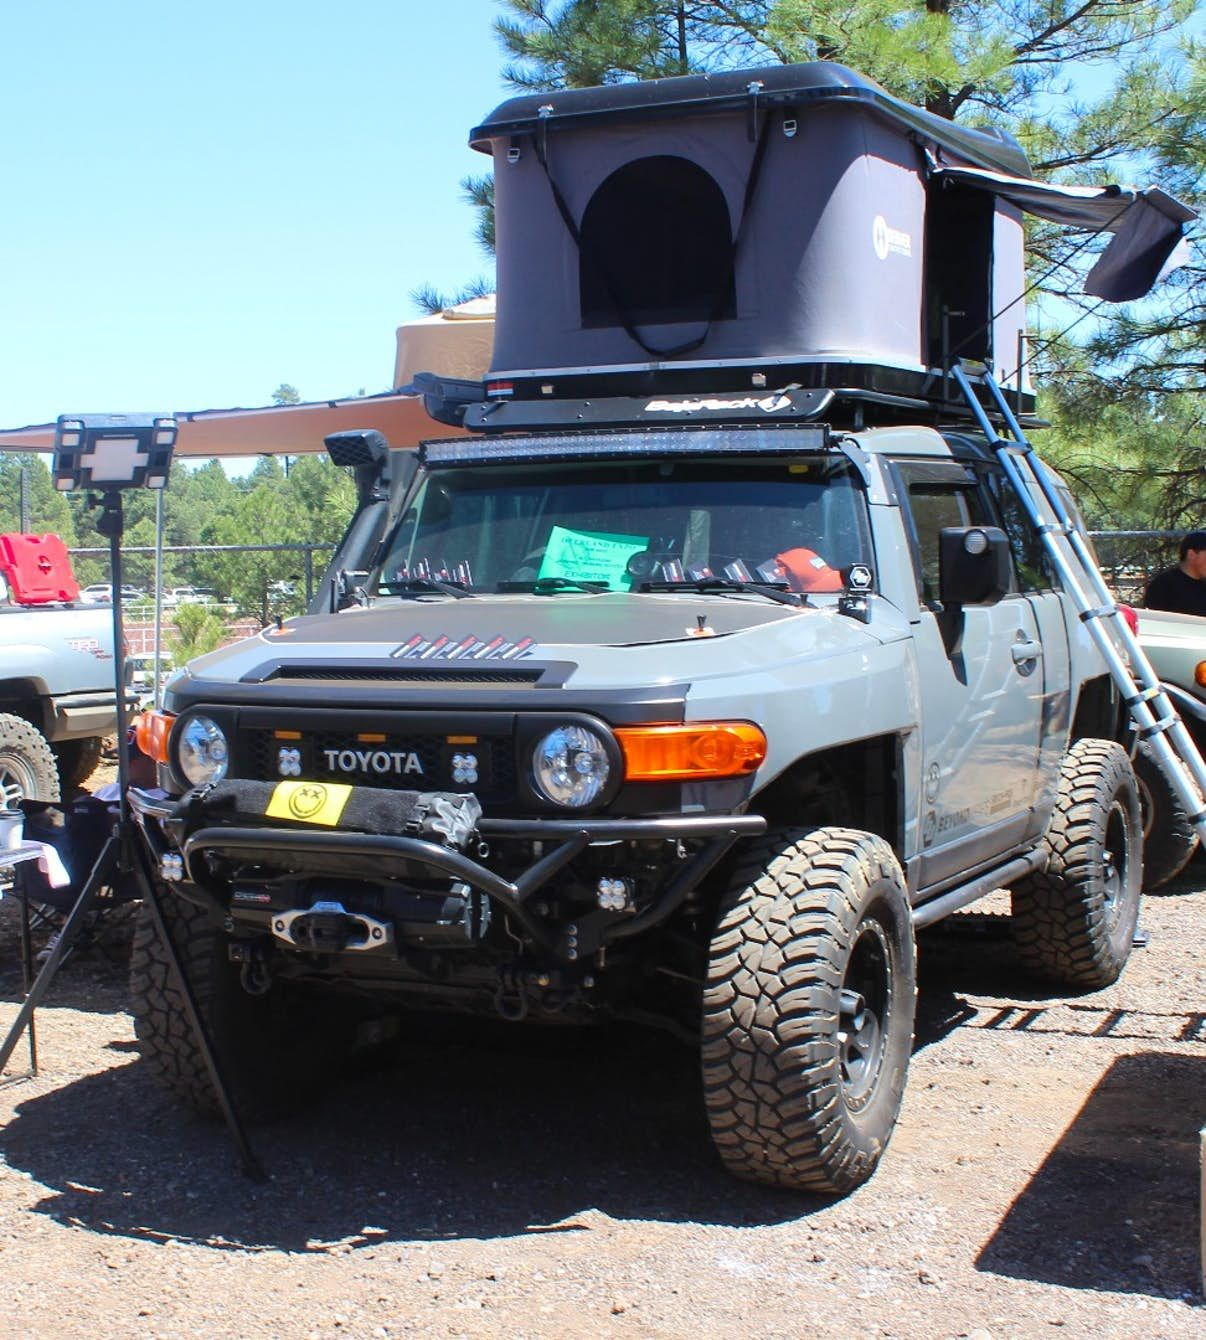 in photos pickup campers big rig motorhomes and adventure vehicles rh pinterest ca